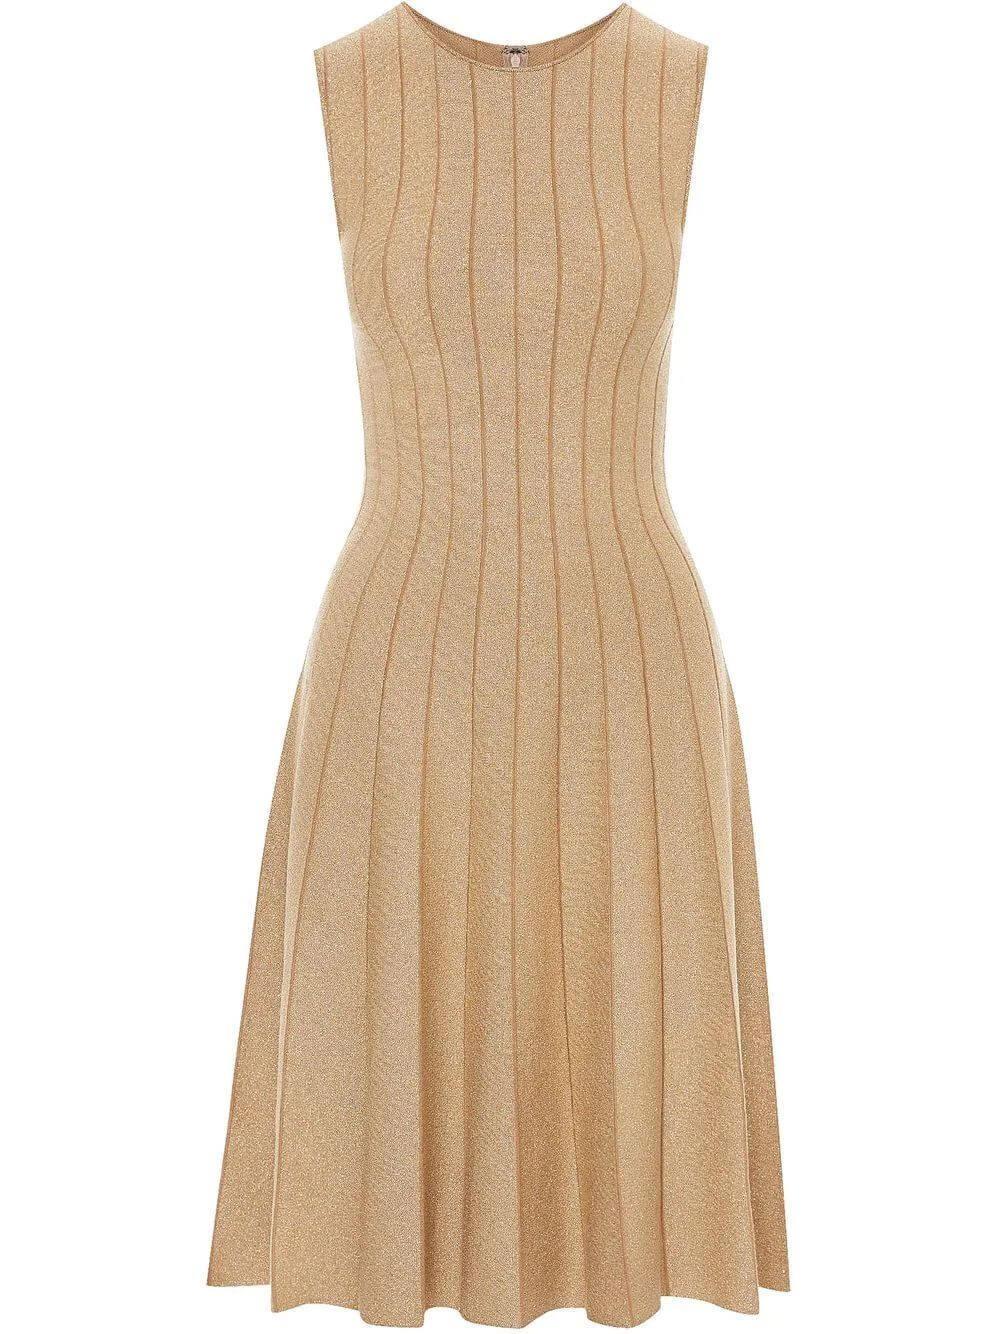 Pleated Lurex Dress Item # 21FN112LUR